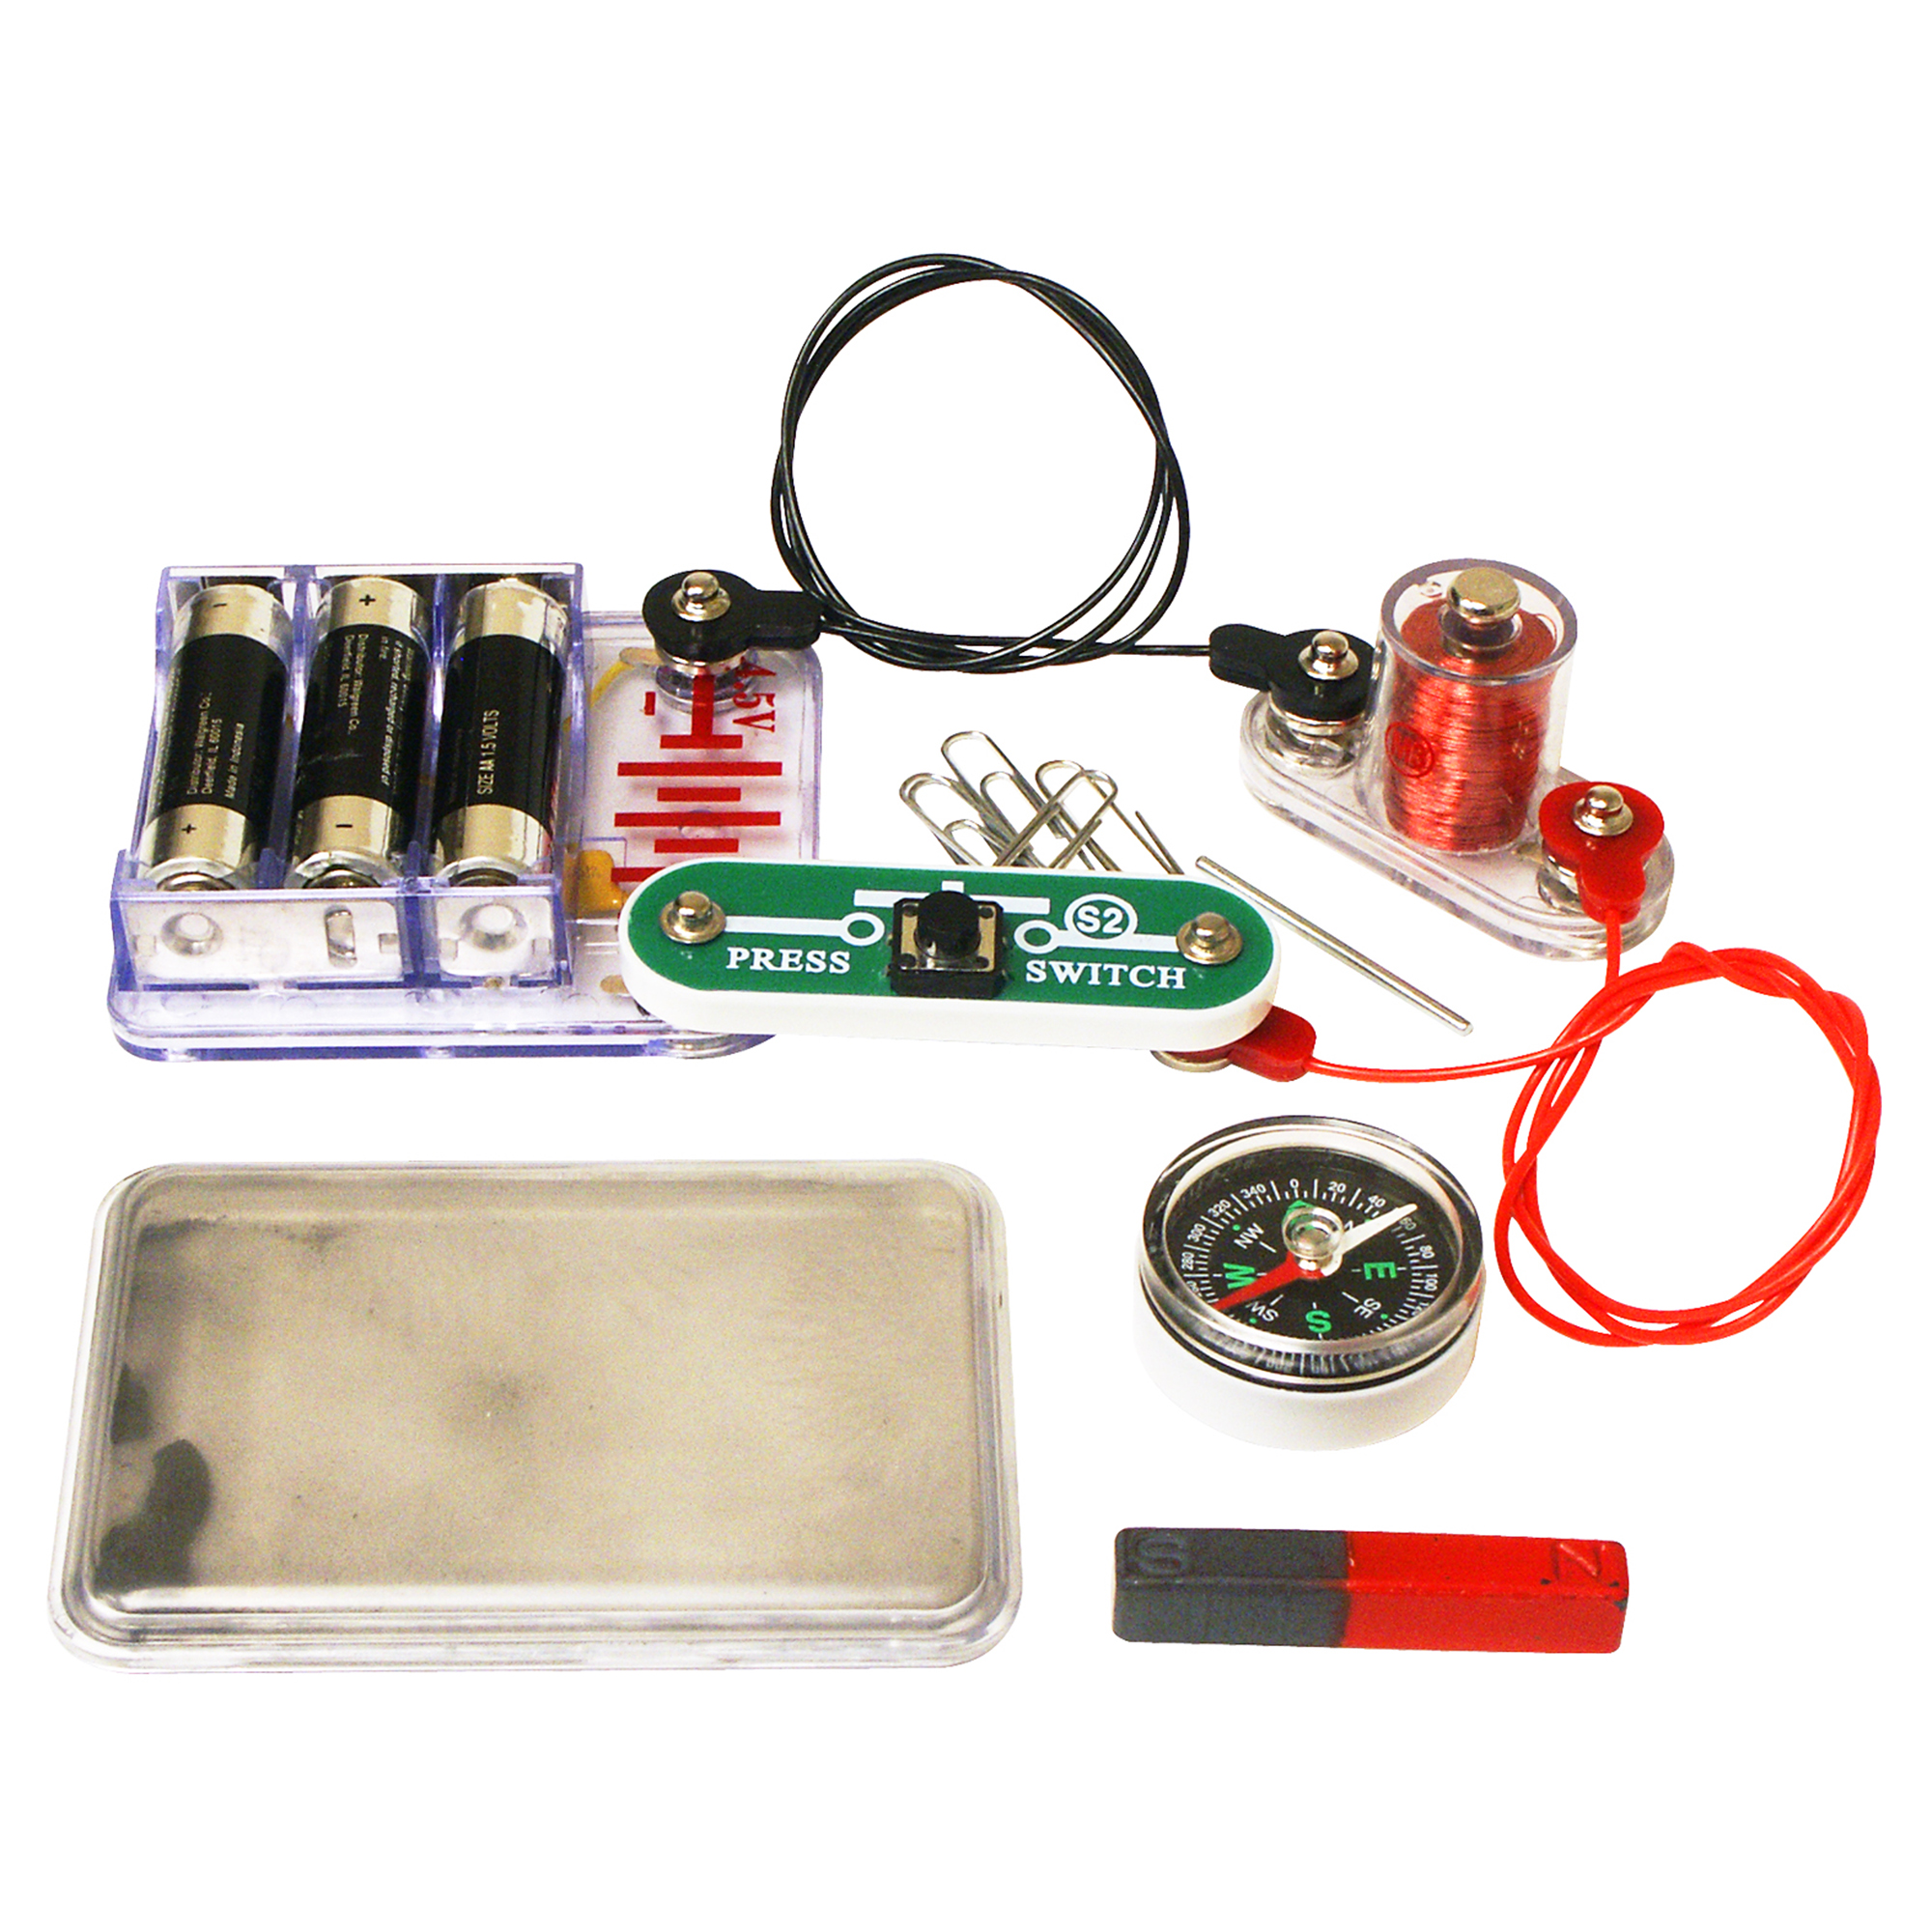 Elenco Snap Circuits Electromagnetism Electronics Inc Scp 08 New Fm Radio Scp12